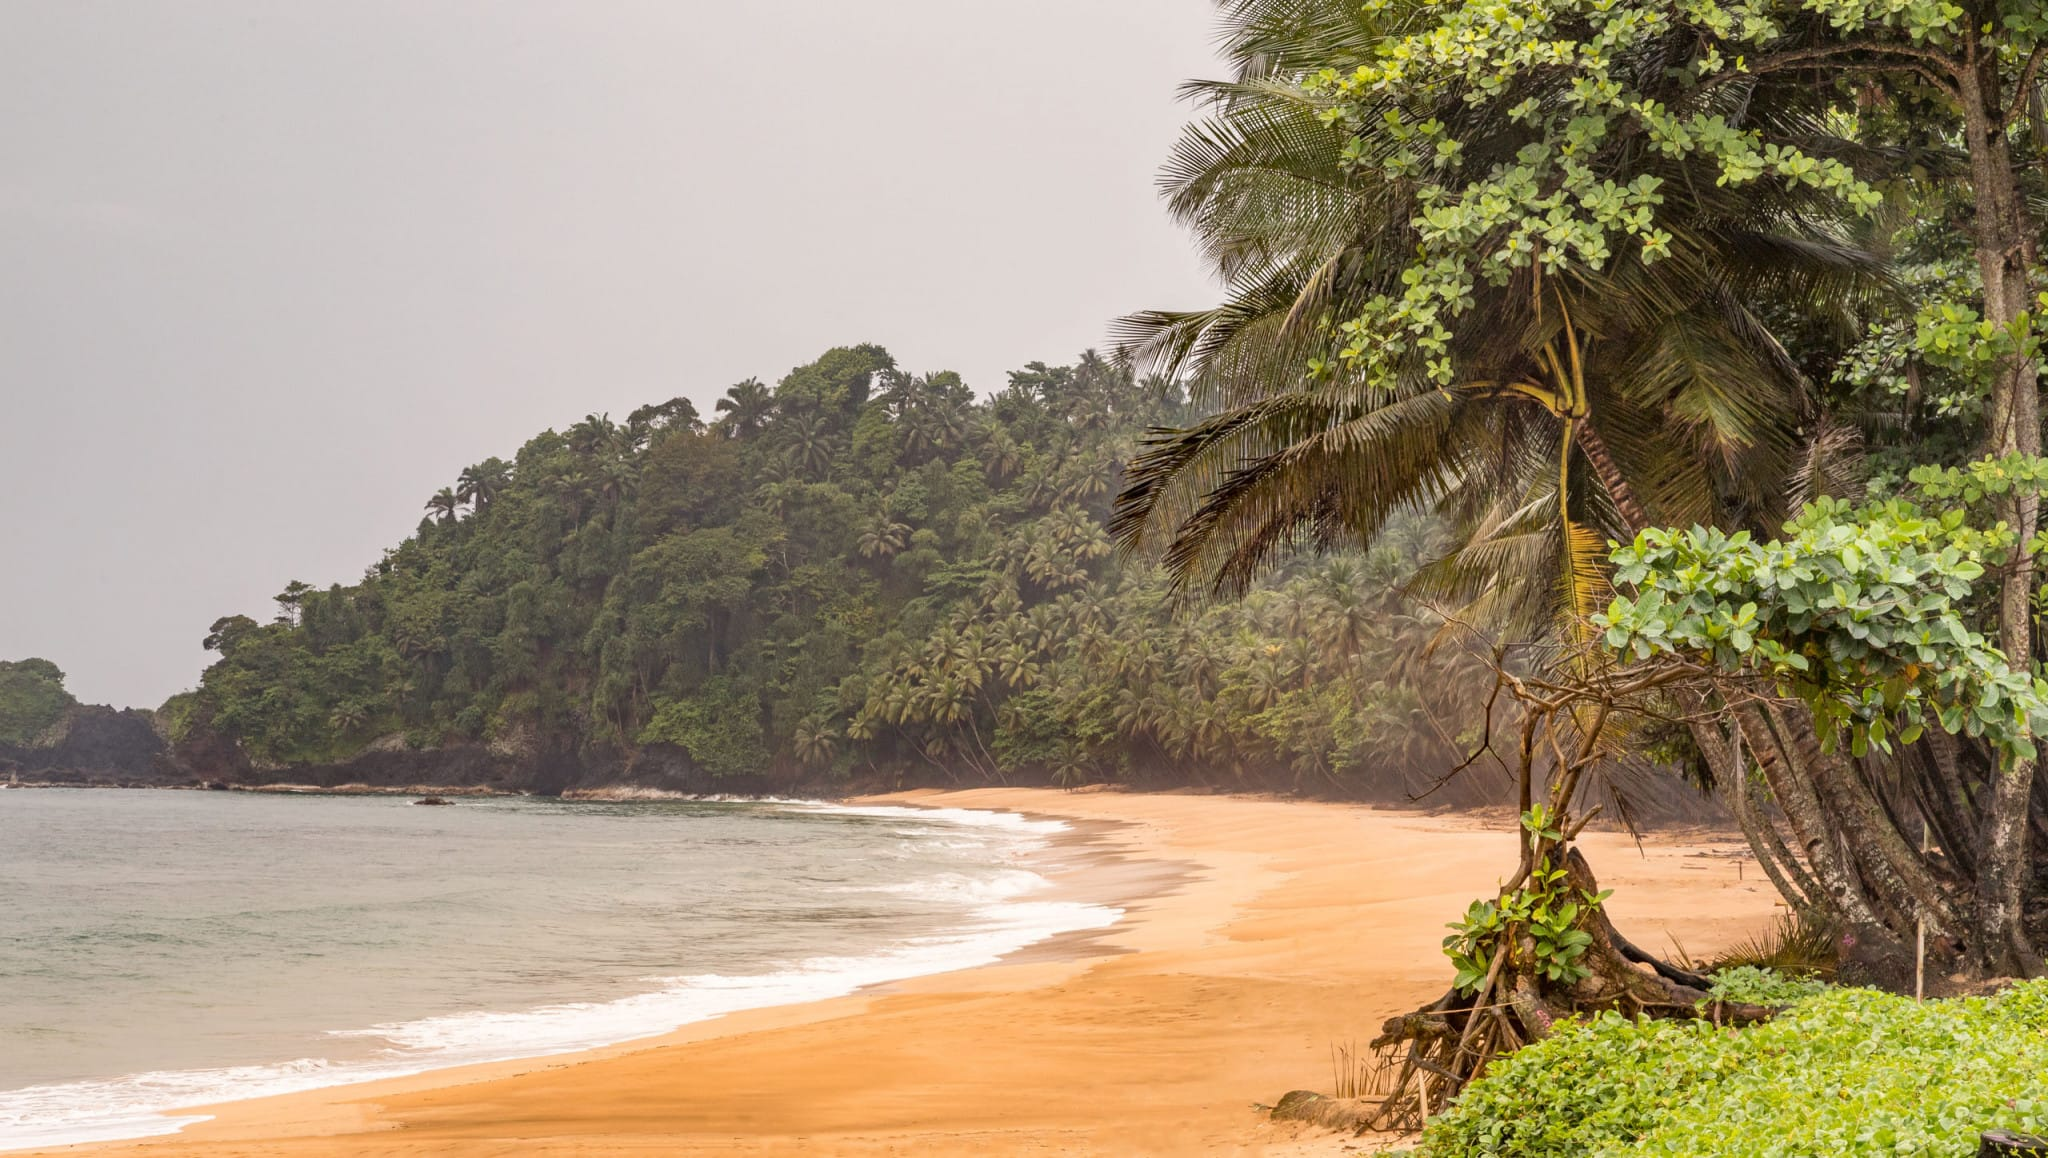 Pristine Beach - SÃO TOMÉ & PRÍNCIPE - A São Tomé itinerary to all the well kept secrets of the island